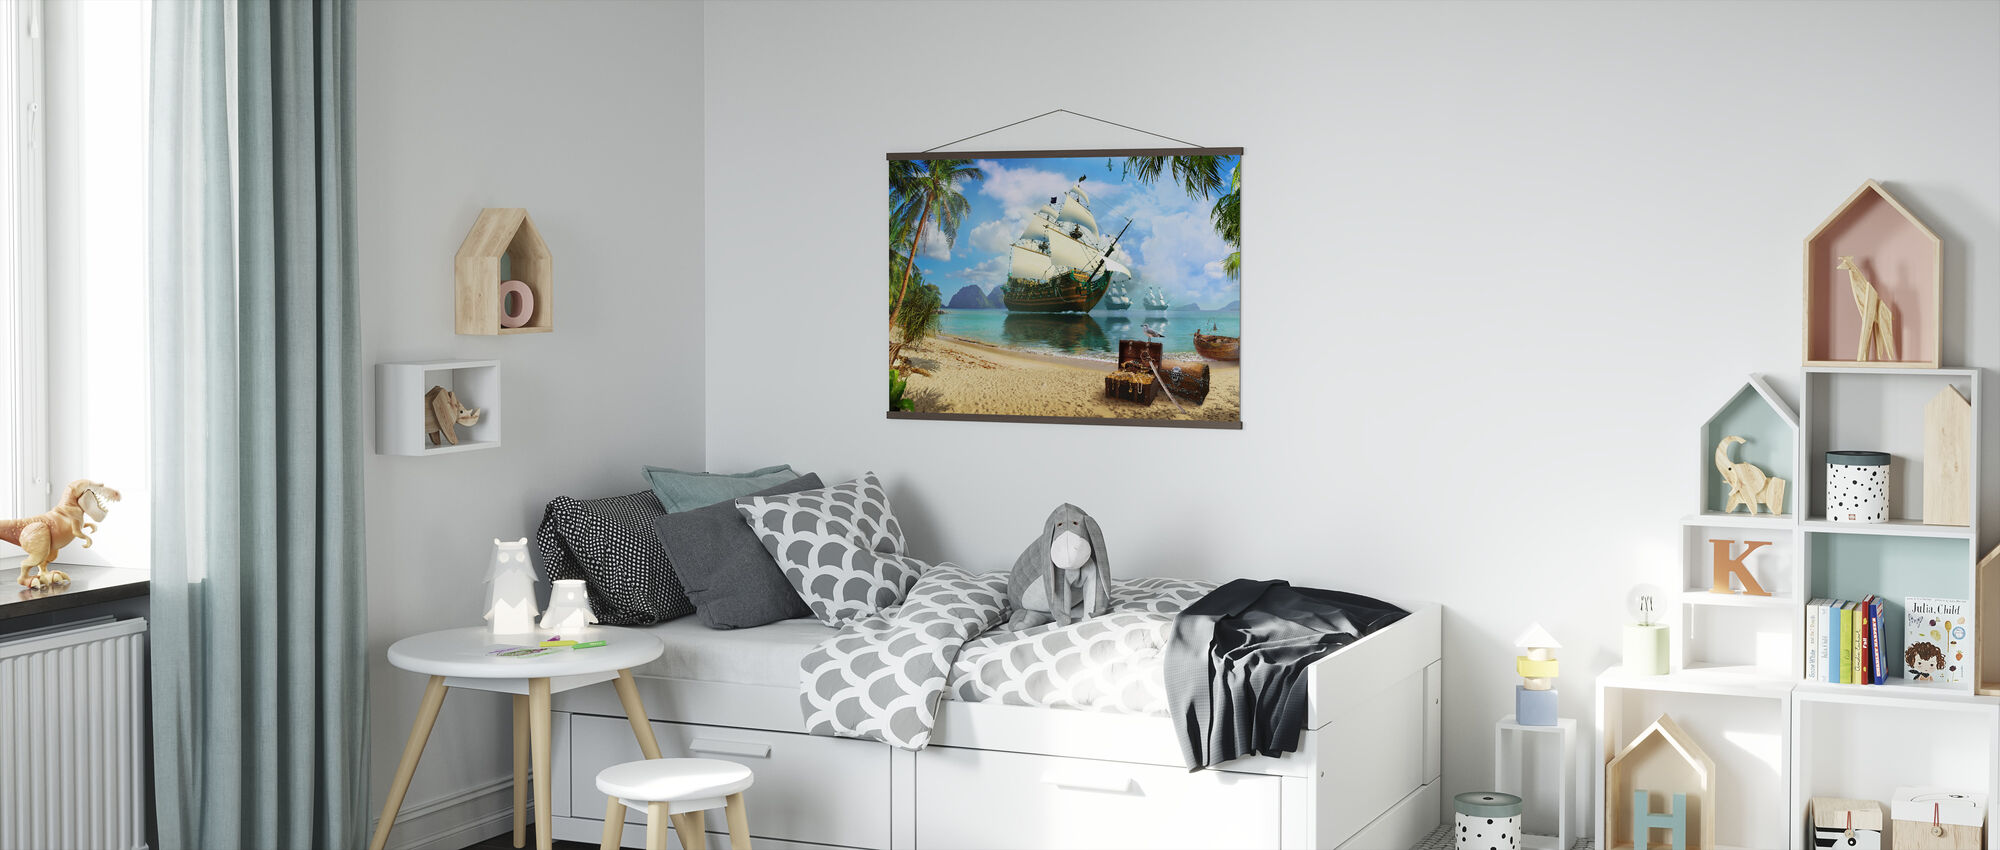 Pirate Treasure Island - Poster - Kids Room